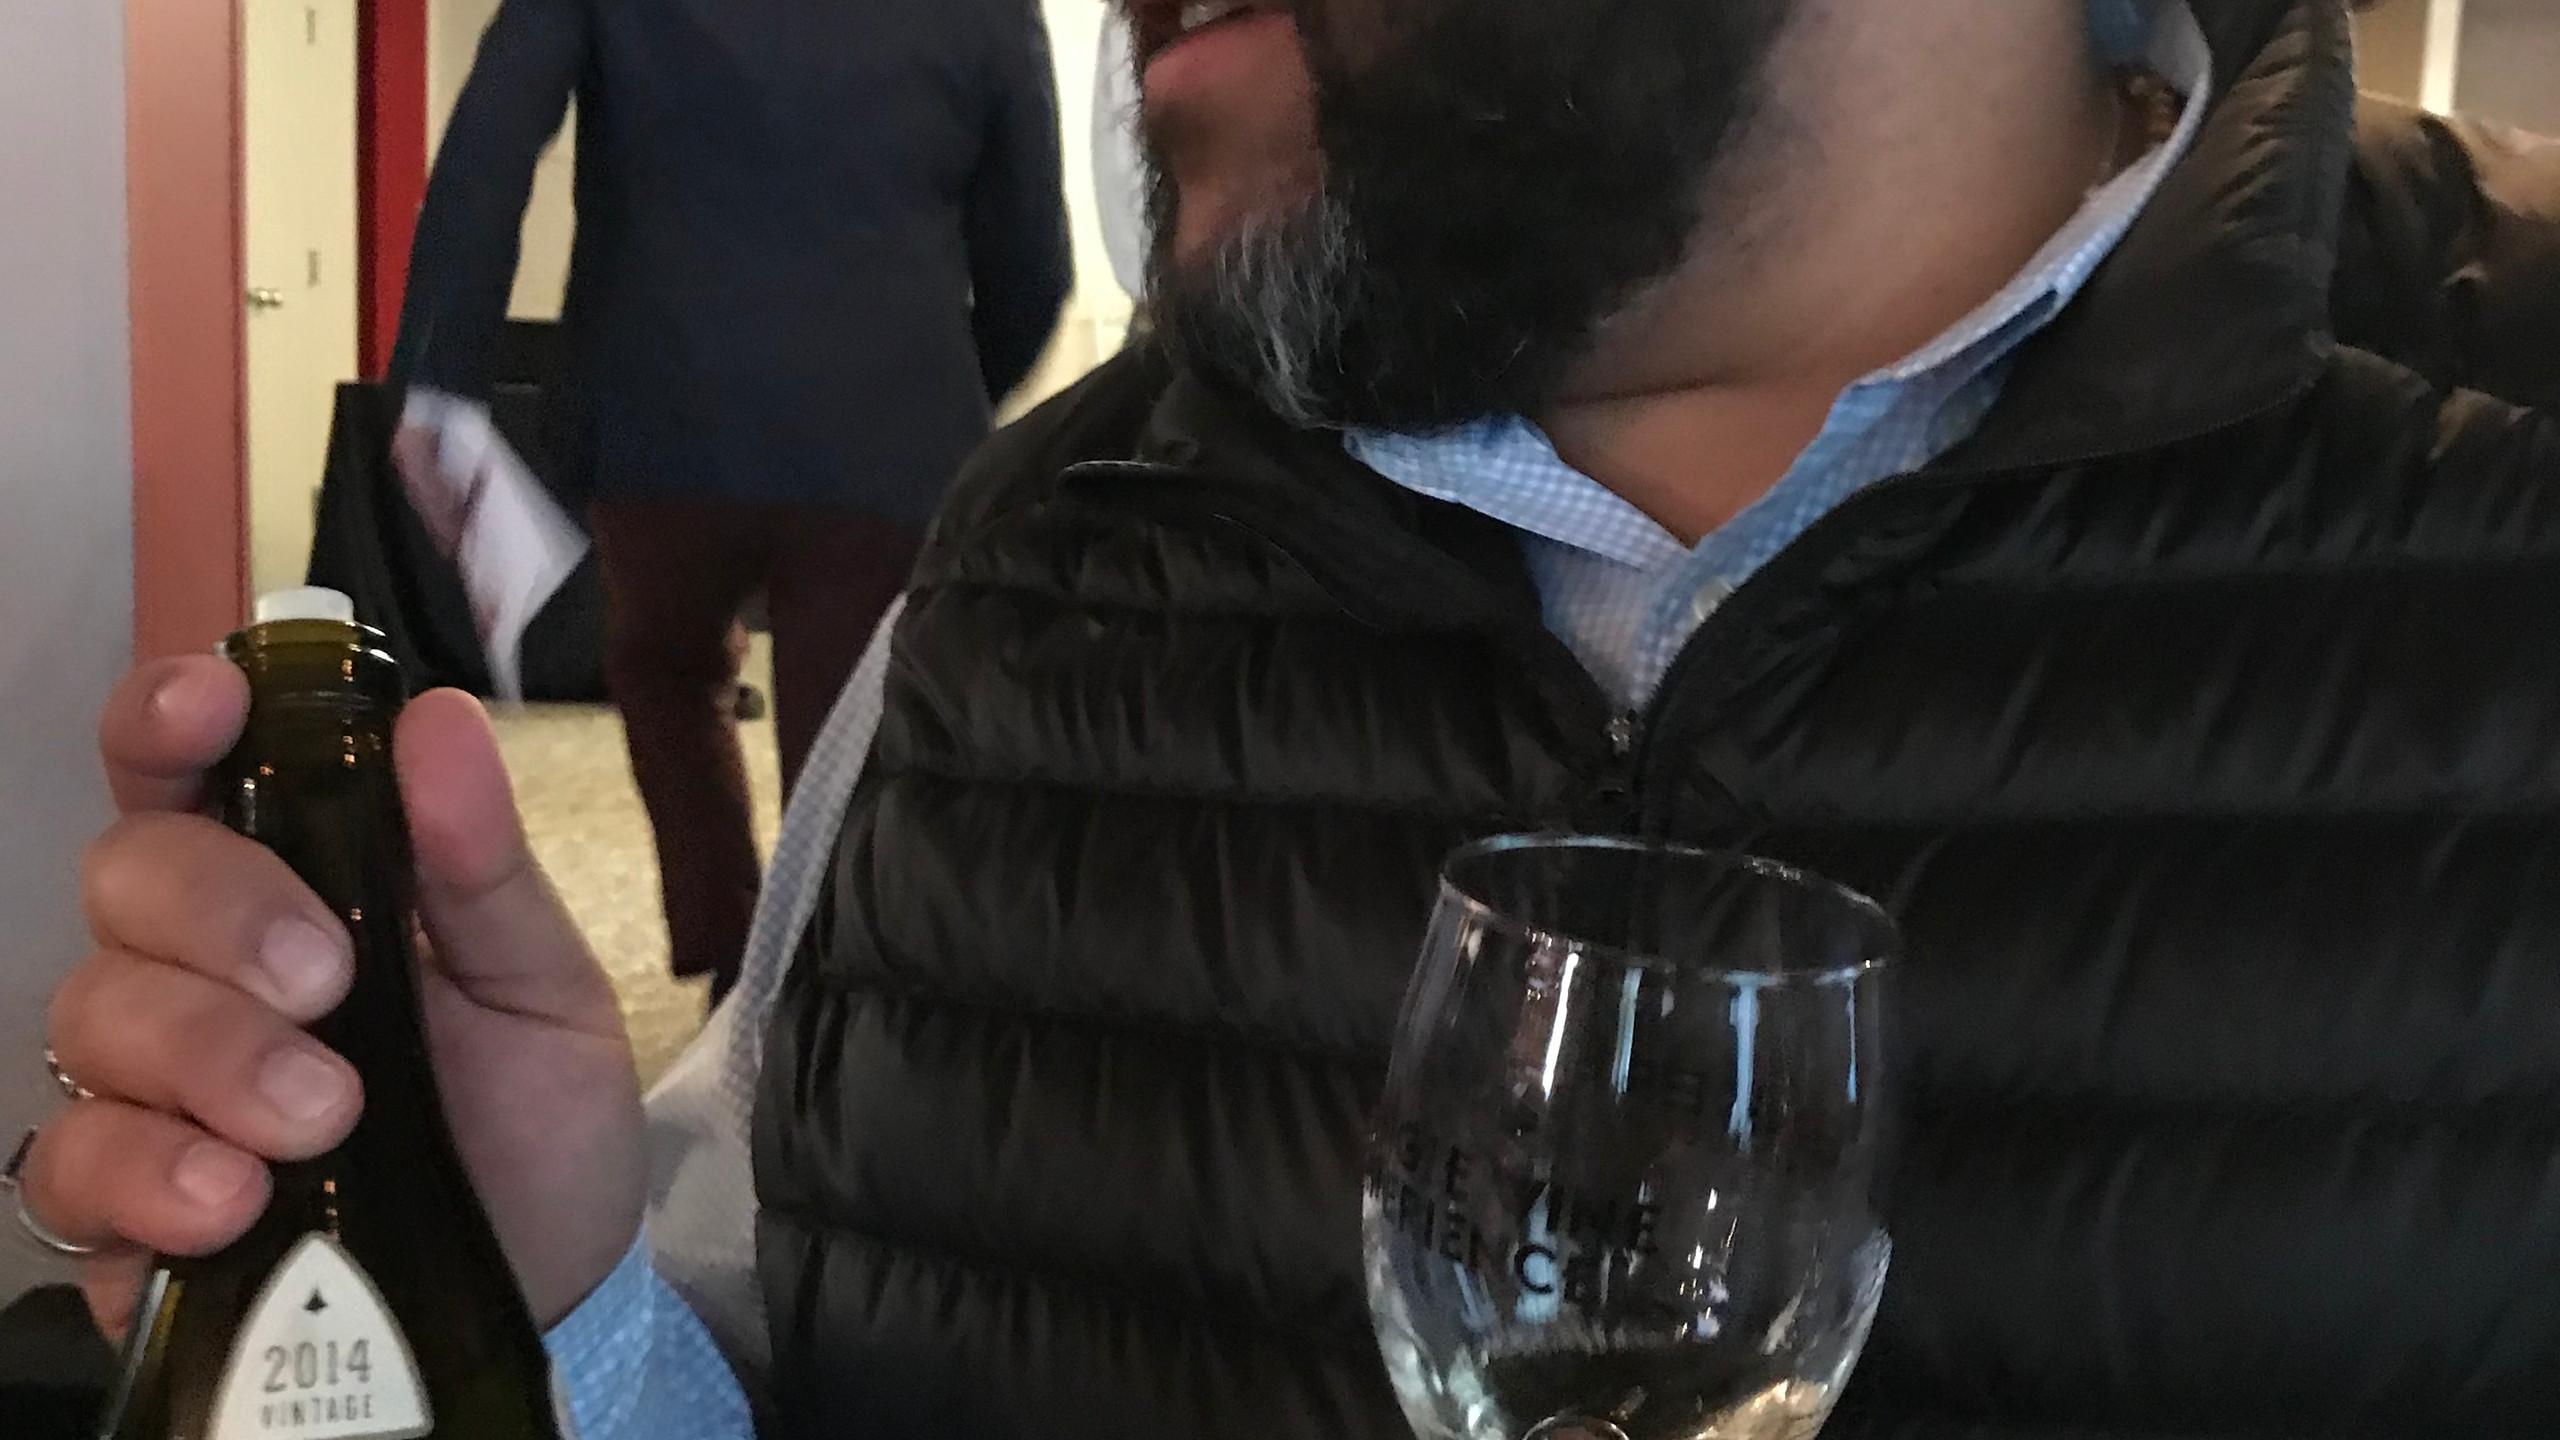 Winemaker Raj Parr